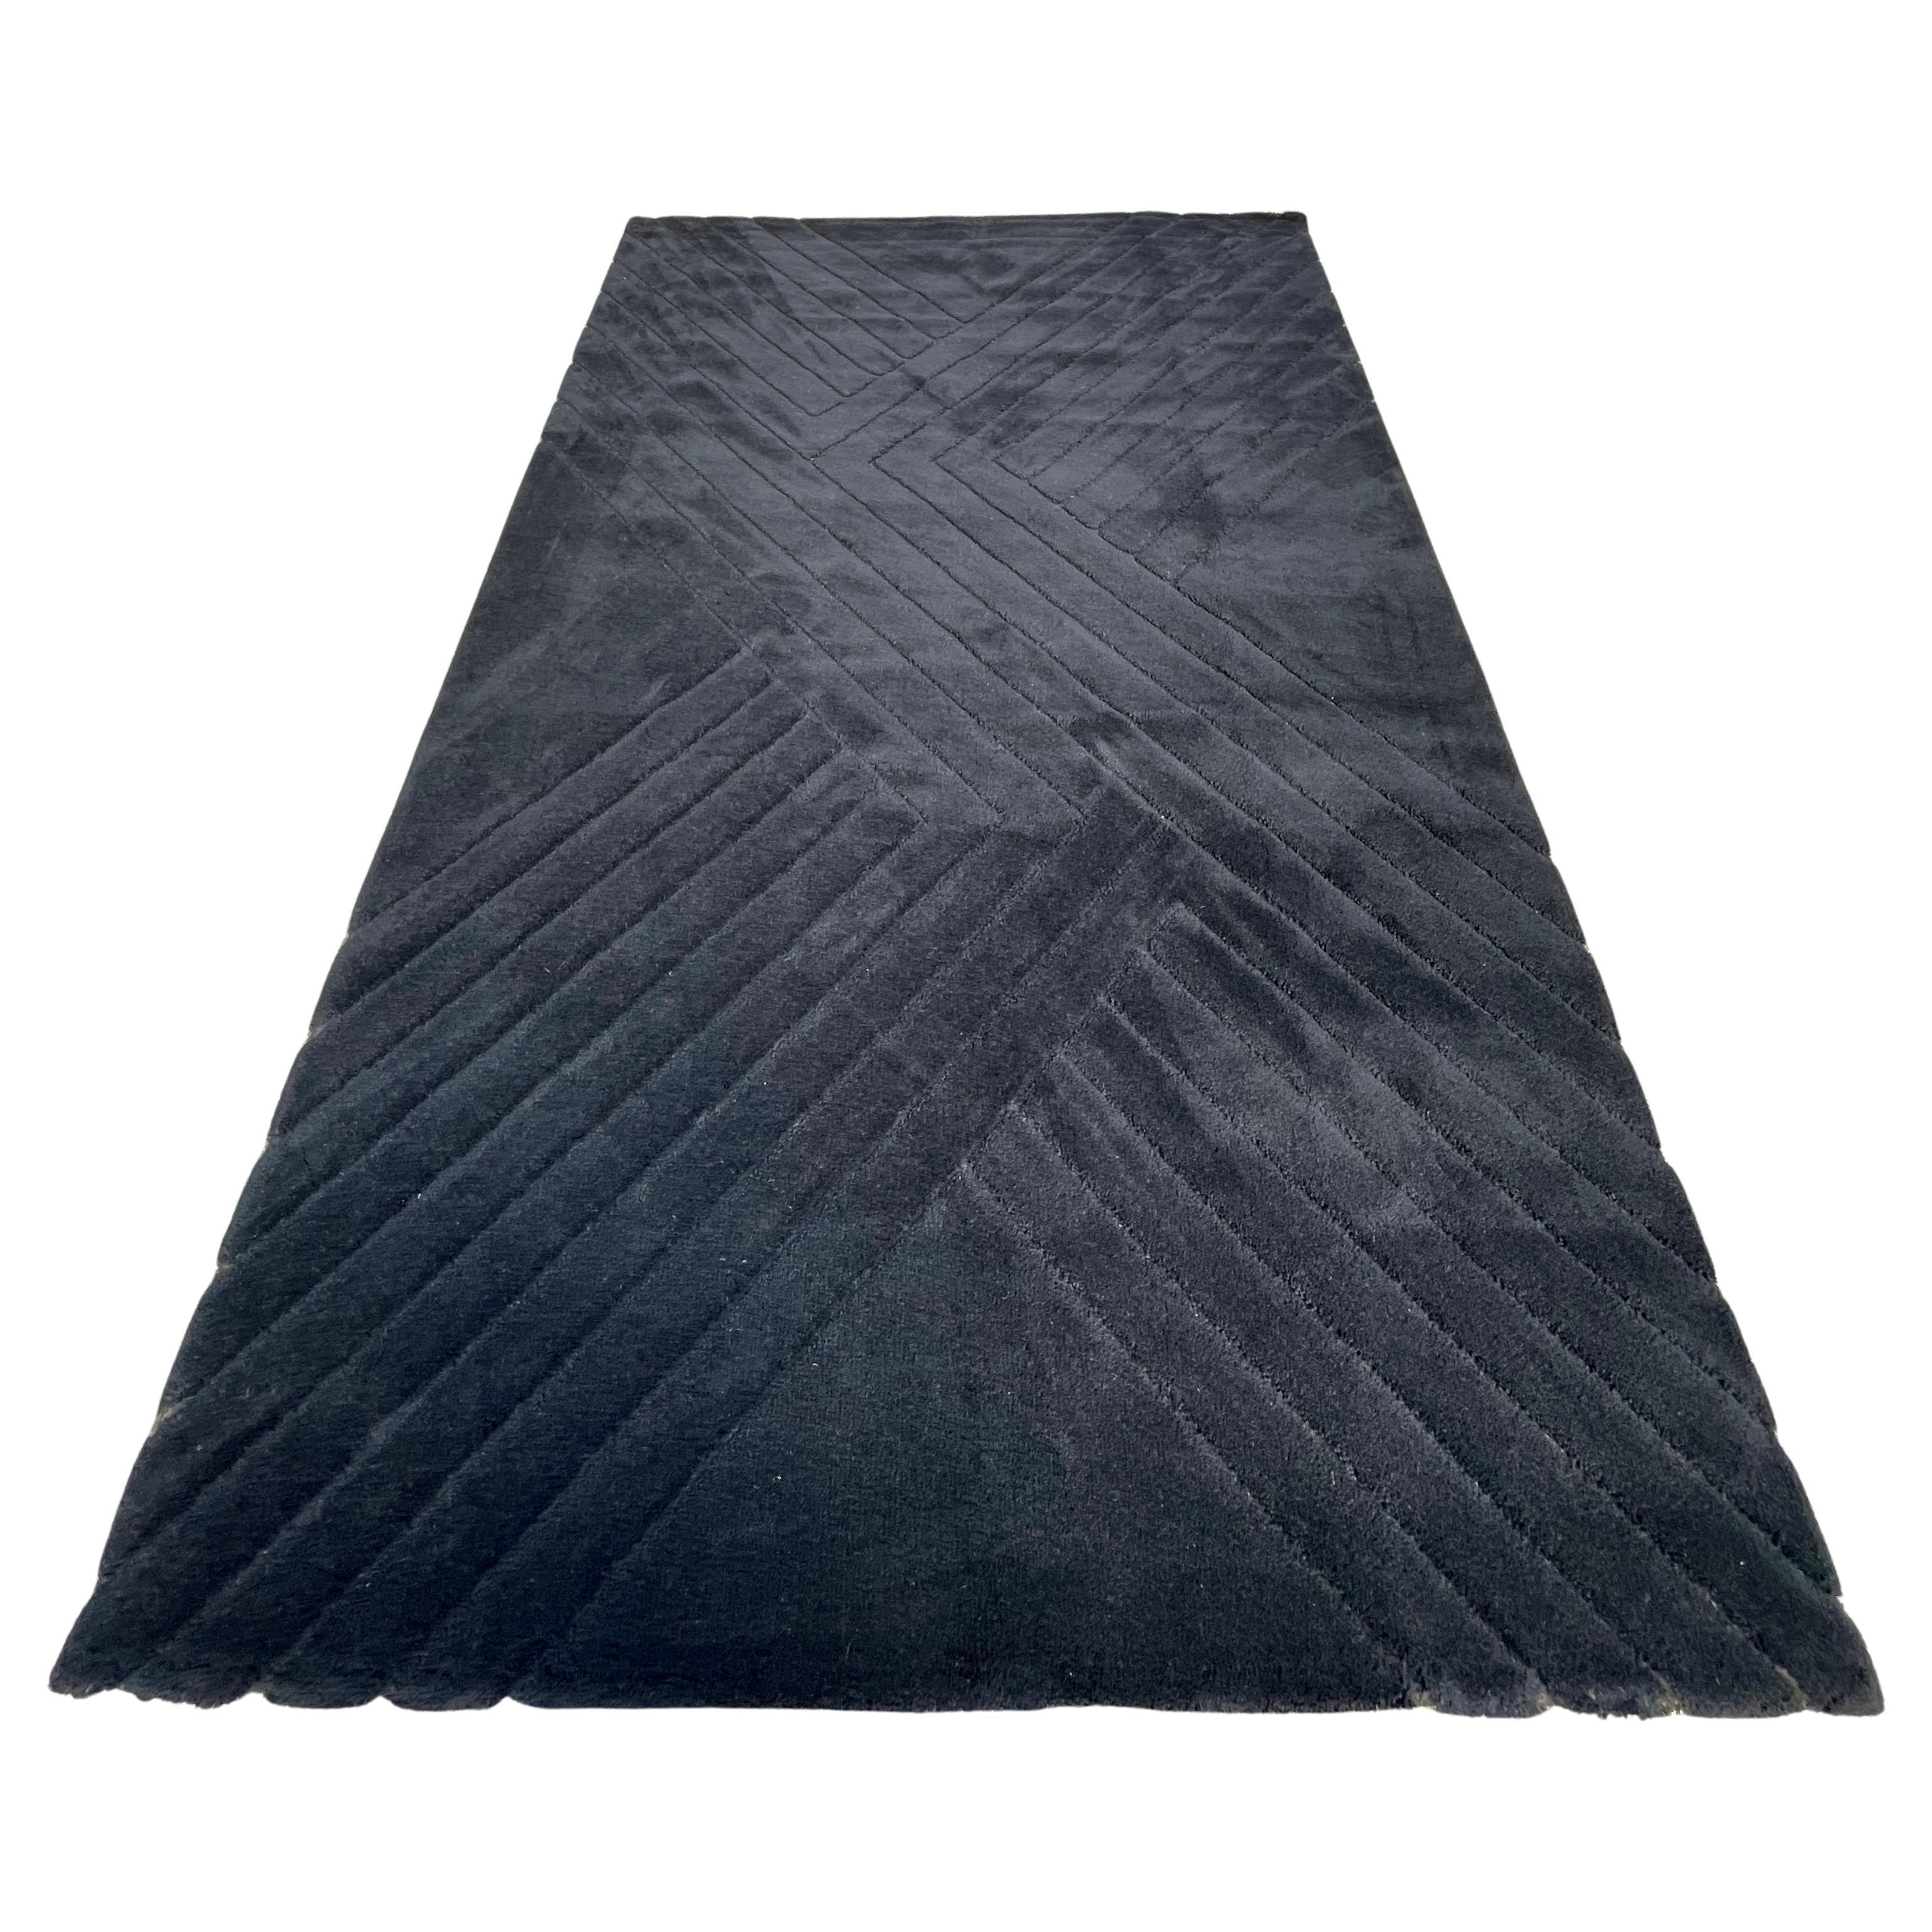 Danish Black Wool Sculpted Rya Rug